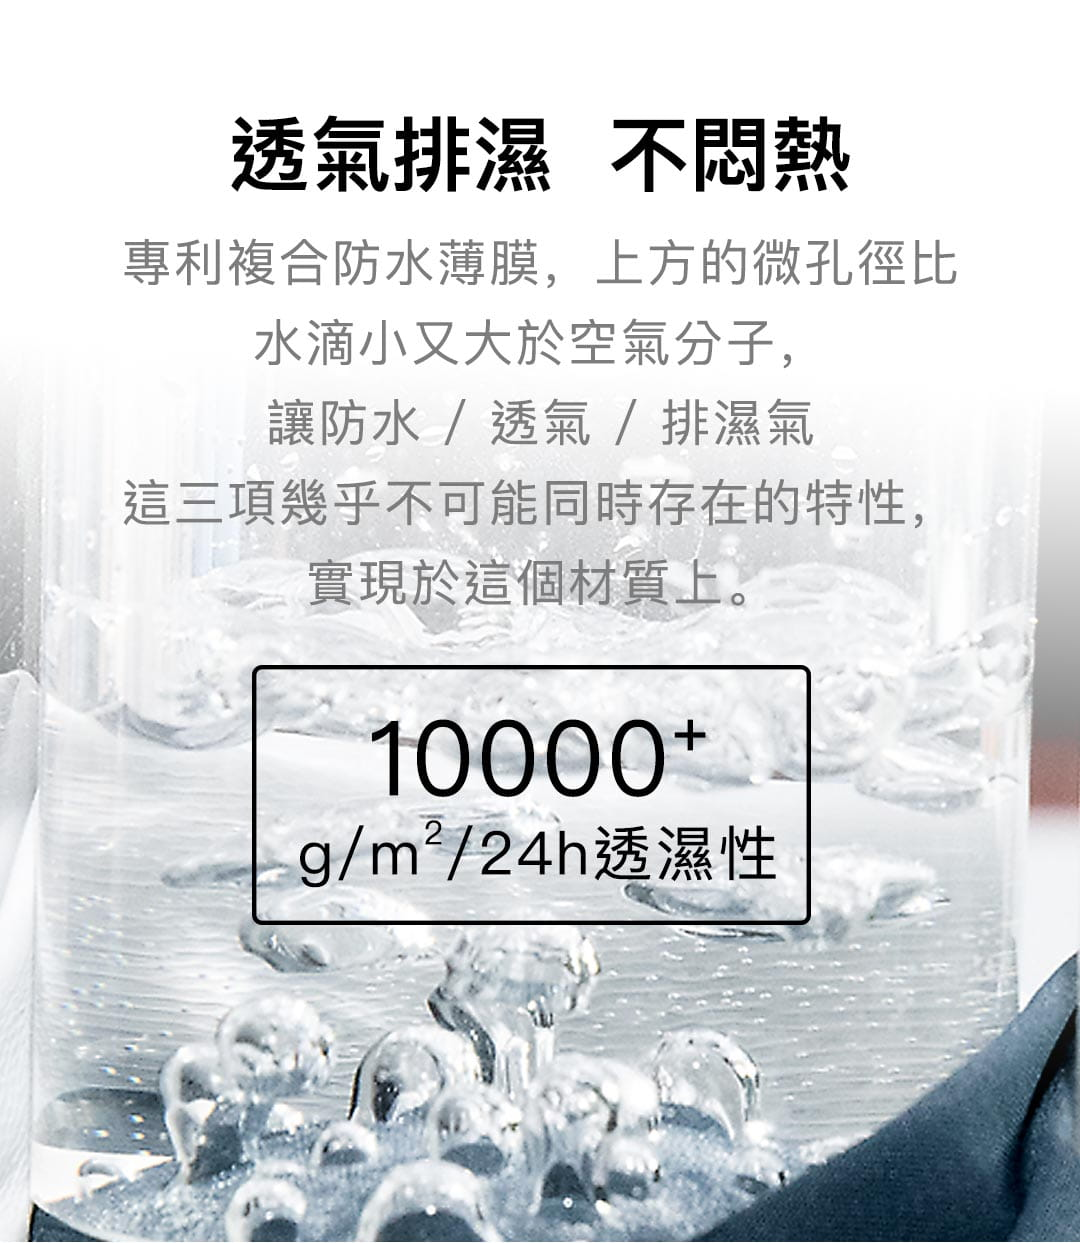 【V-TEX 地表最強防水鞋】【V-TEX機能防水鞋】 雙11優選款式 (3款任選) 14